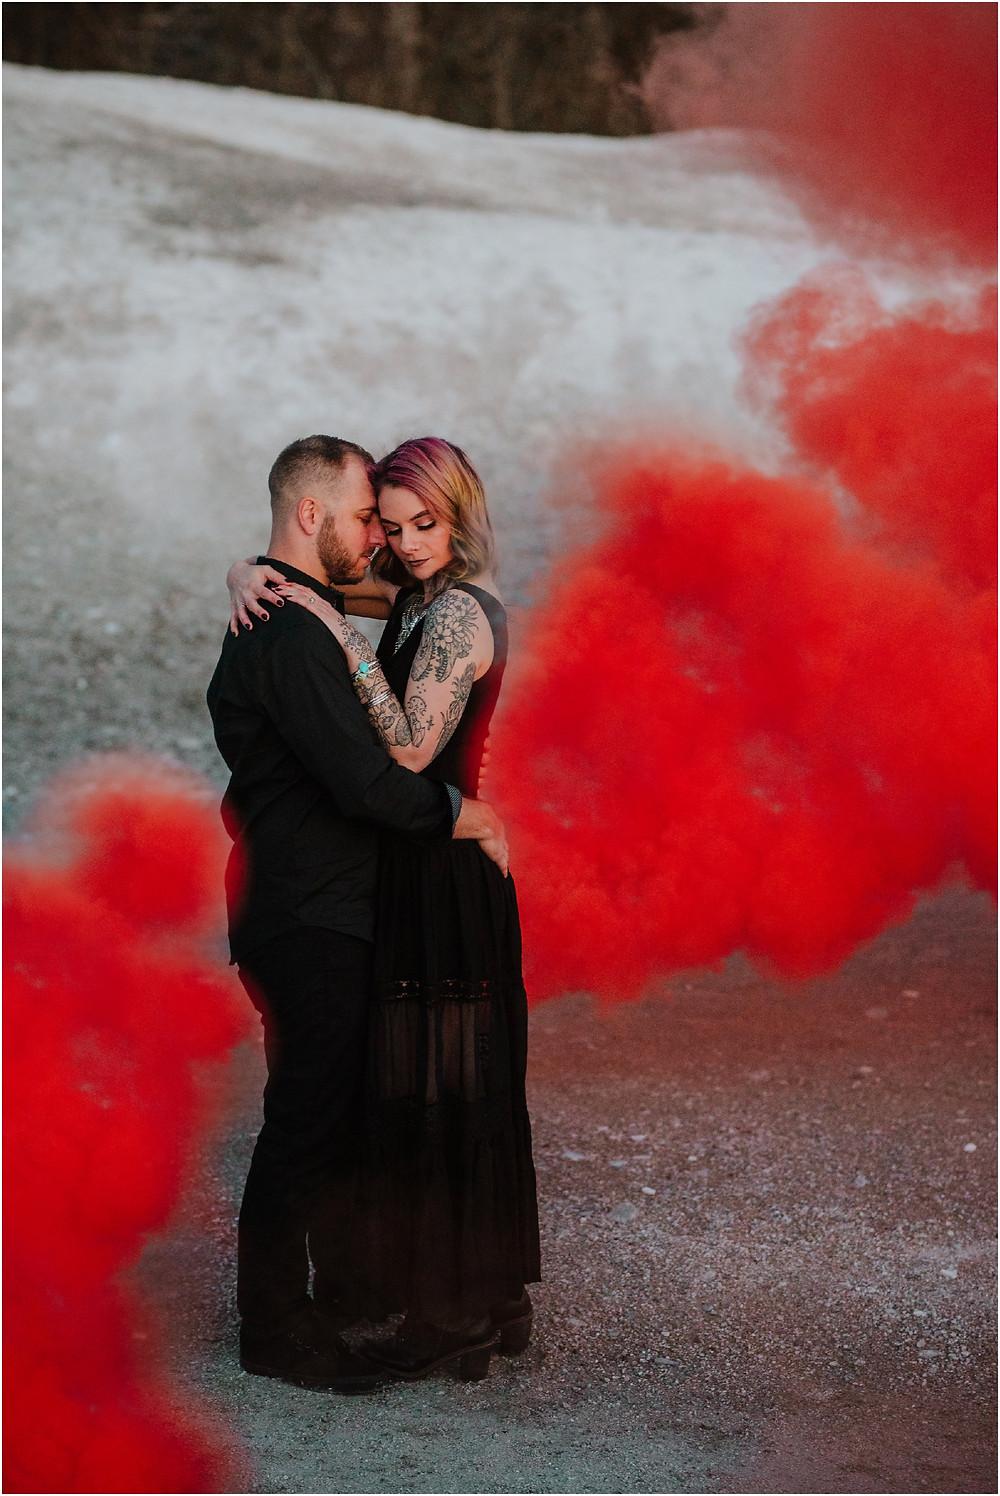 Smoke Bomb Moody Pennsylvania Engagement Session by Karen Rainier Photography